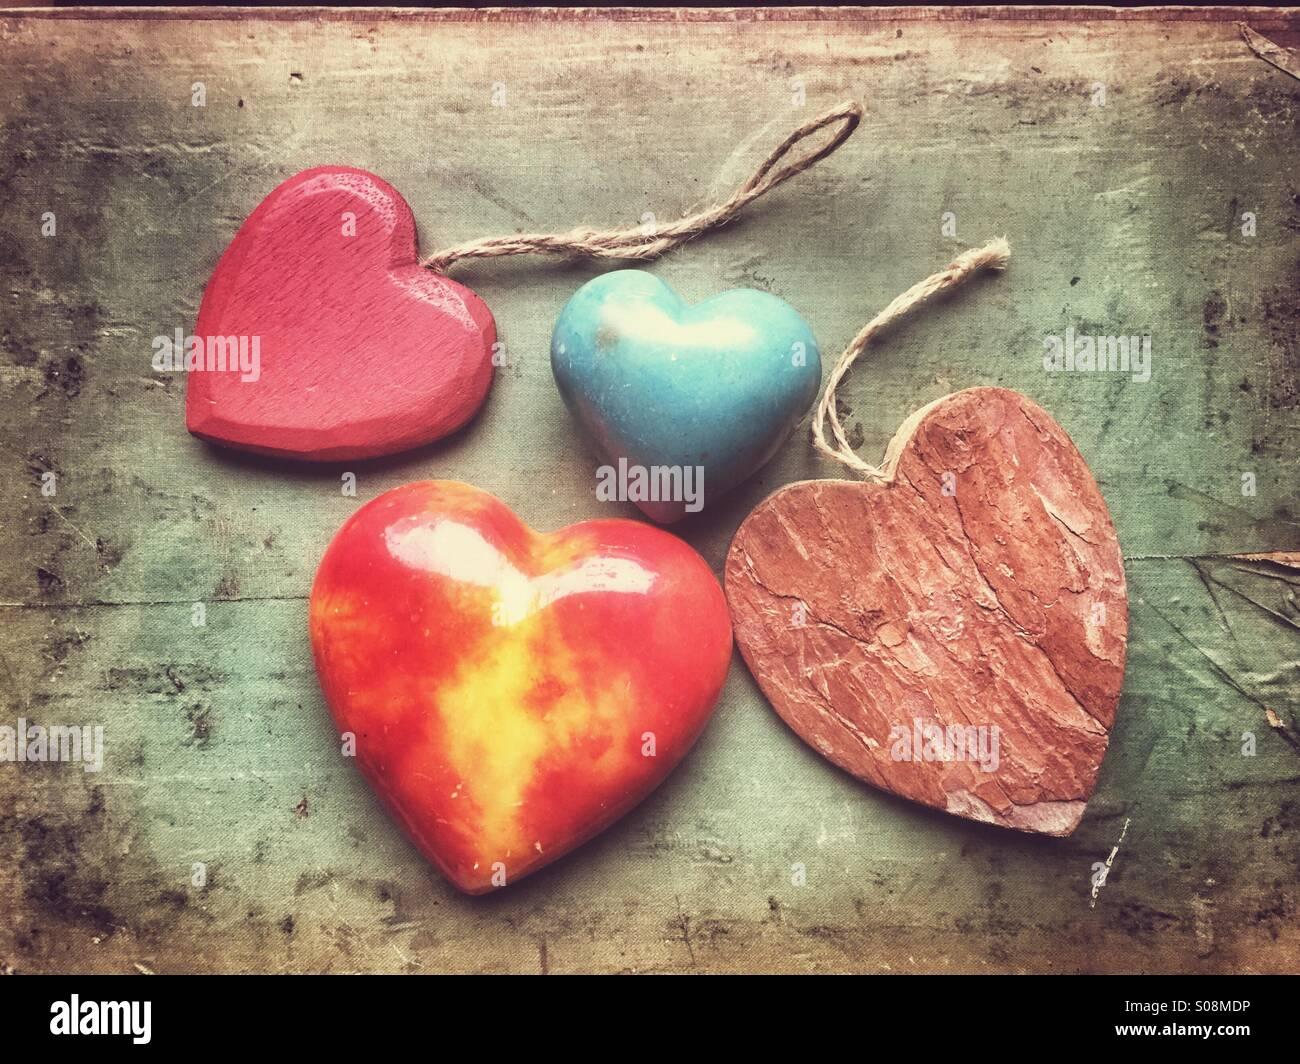 Love hearts - Stock Image